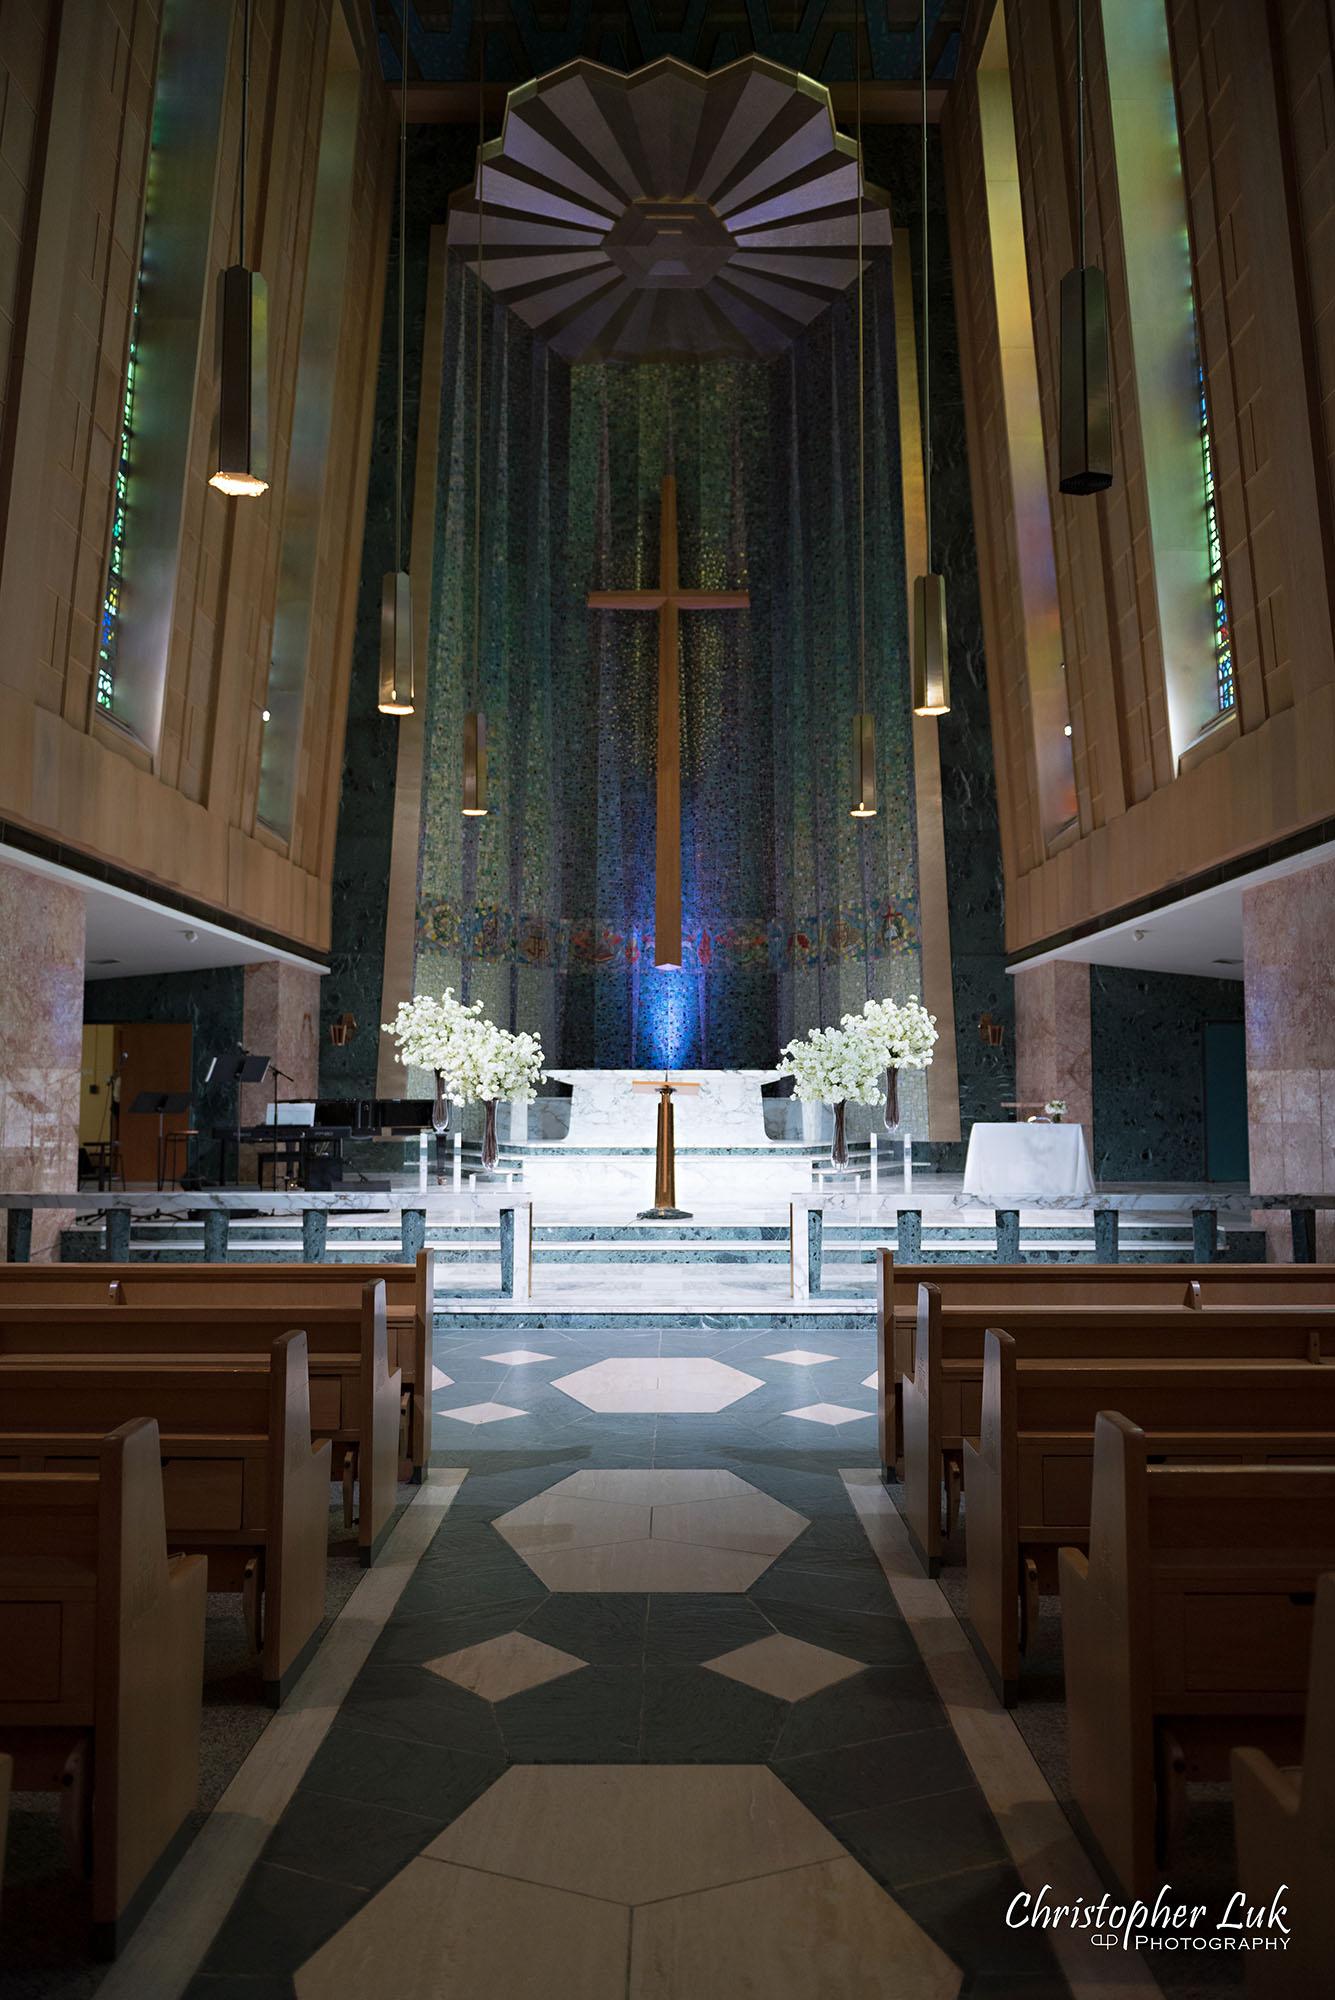 Christopher Luk Toronto Wedding Photography Tyndale Chapel Church Ceremony Venue Location Altar